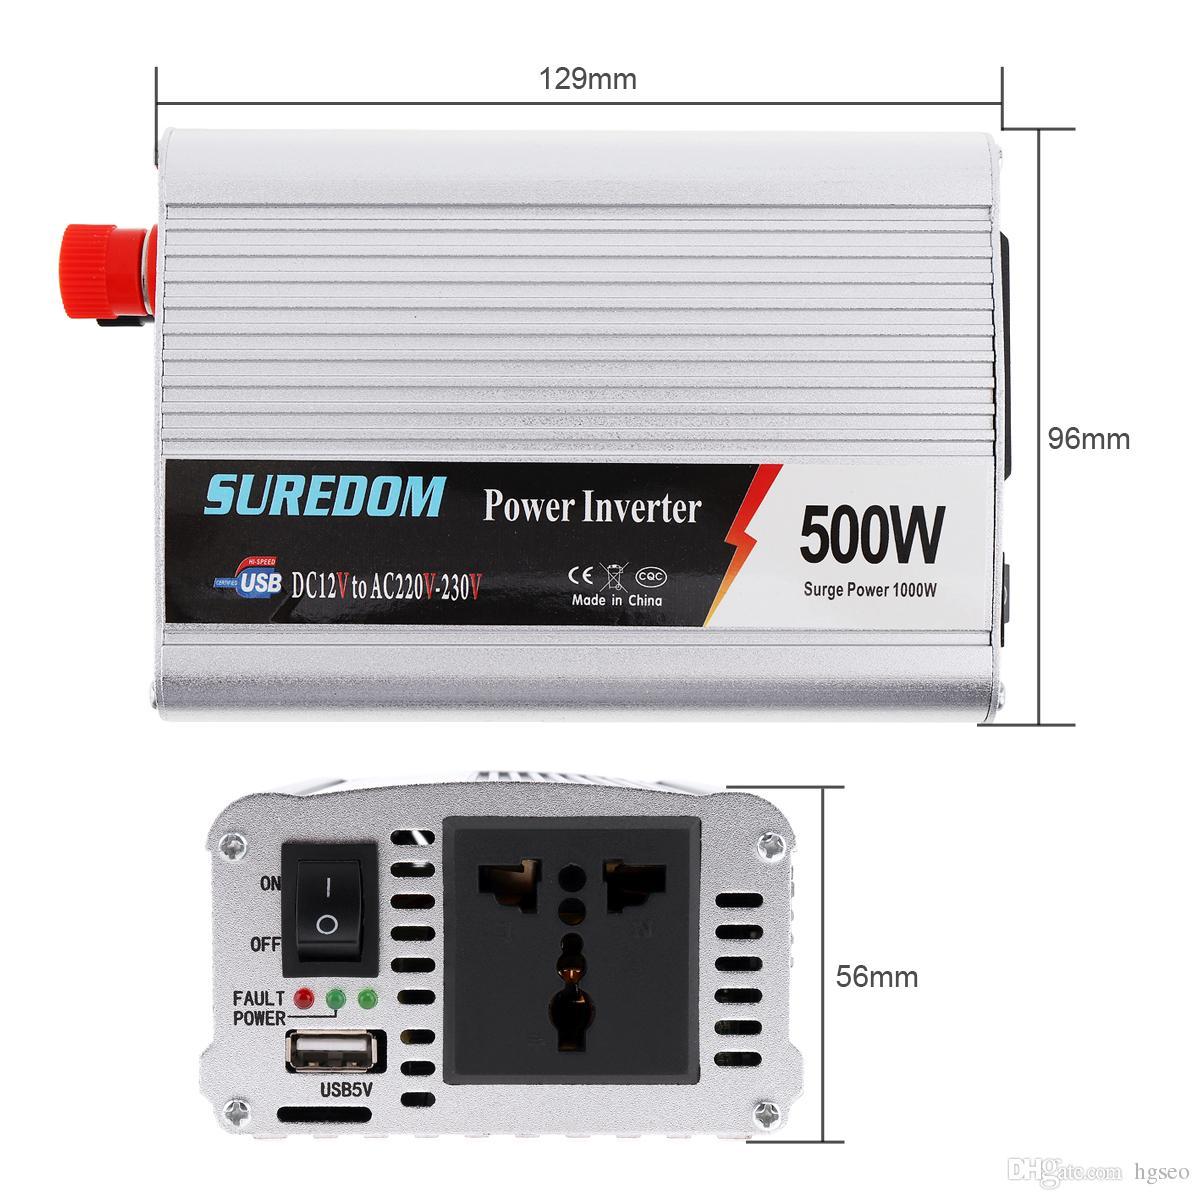 500W DC 12V 24V to AC 220V 110V Vehicle Power Inverter USB Adapter Portable Voltage Transformer Car Charger Surge Power 1000W CEC_62O